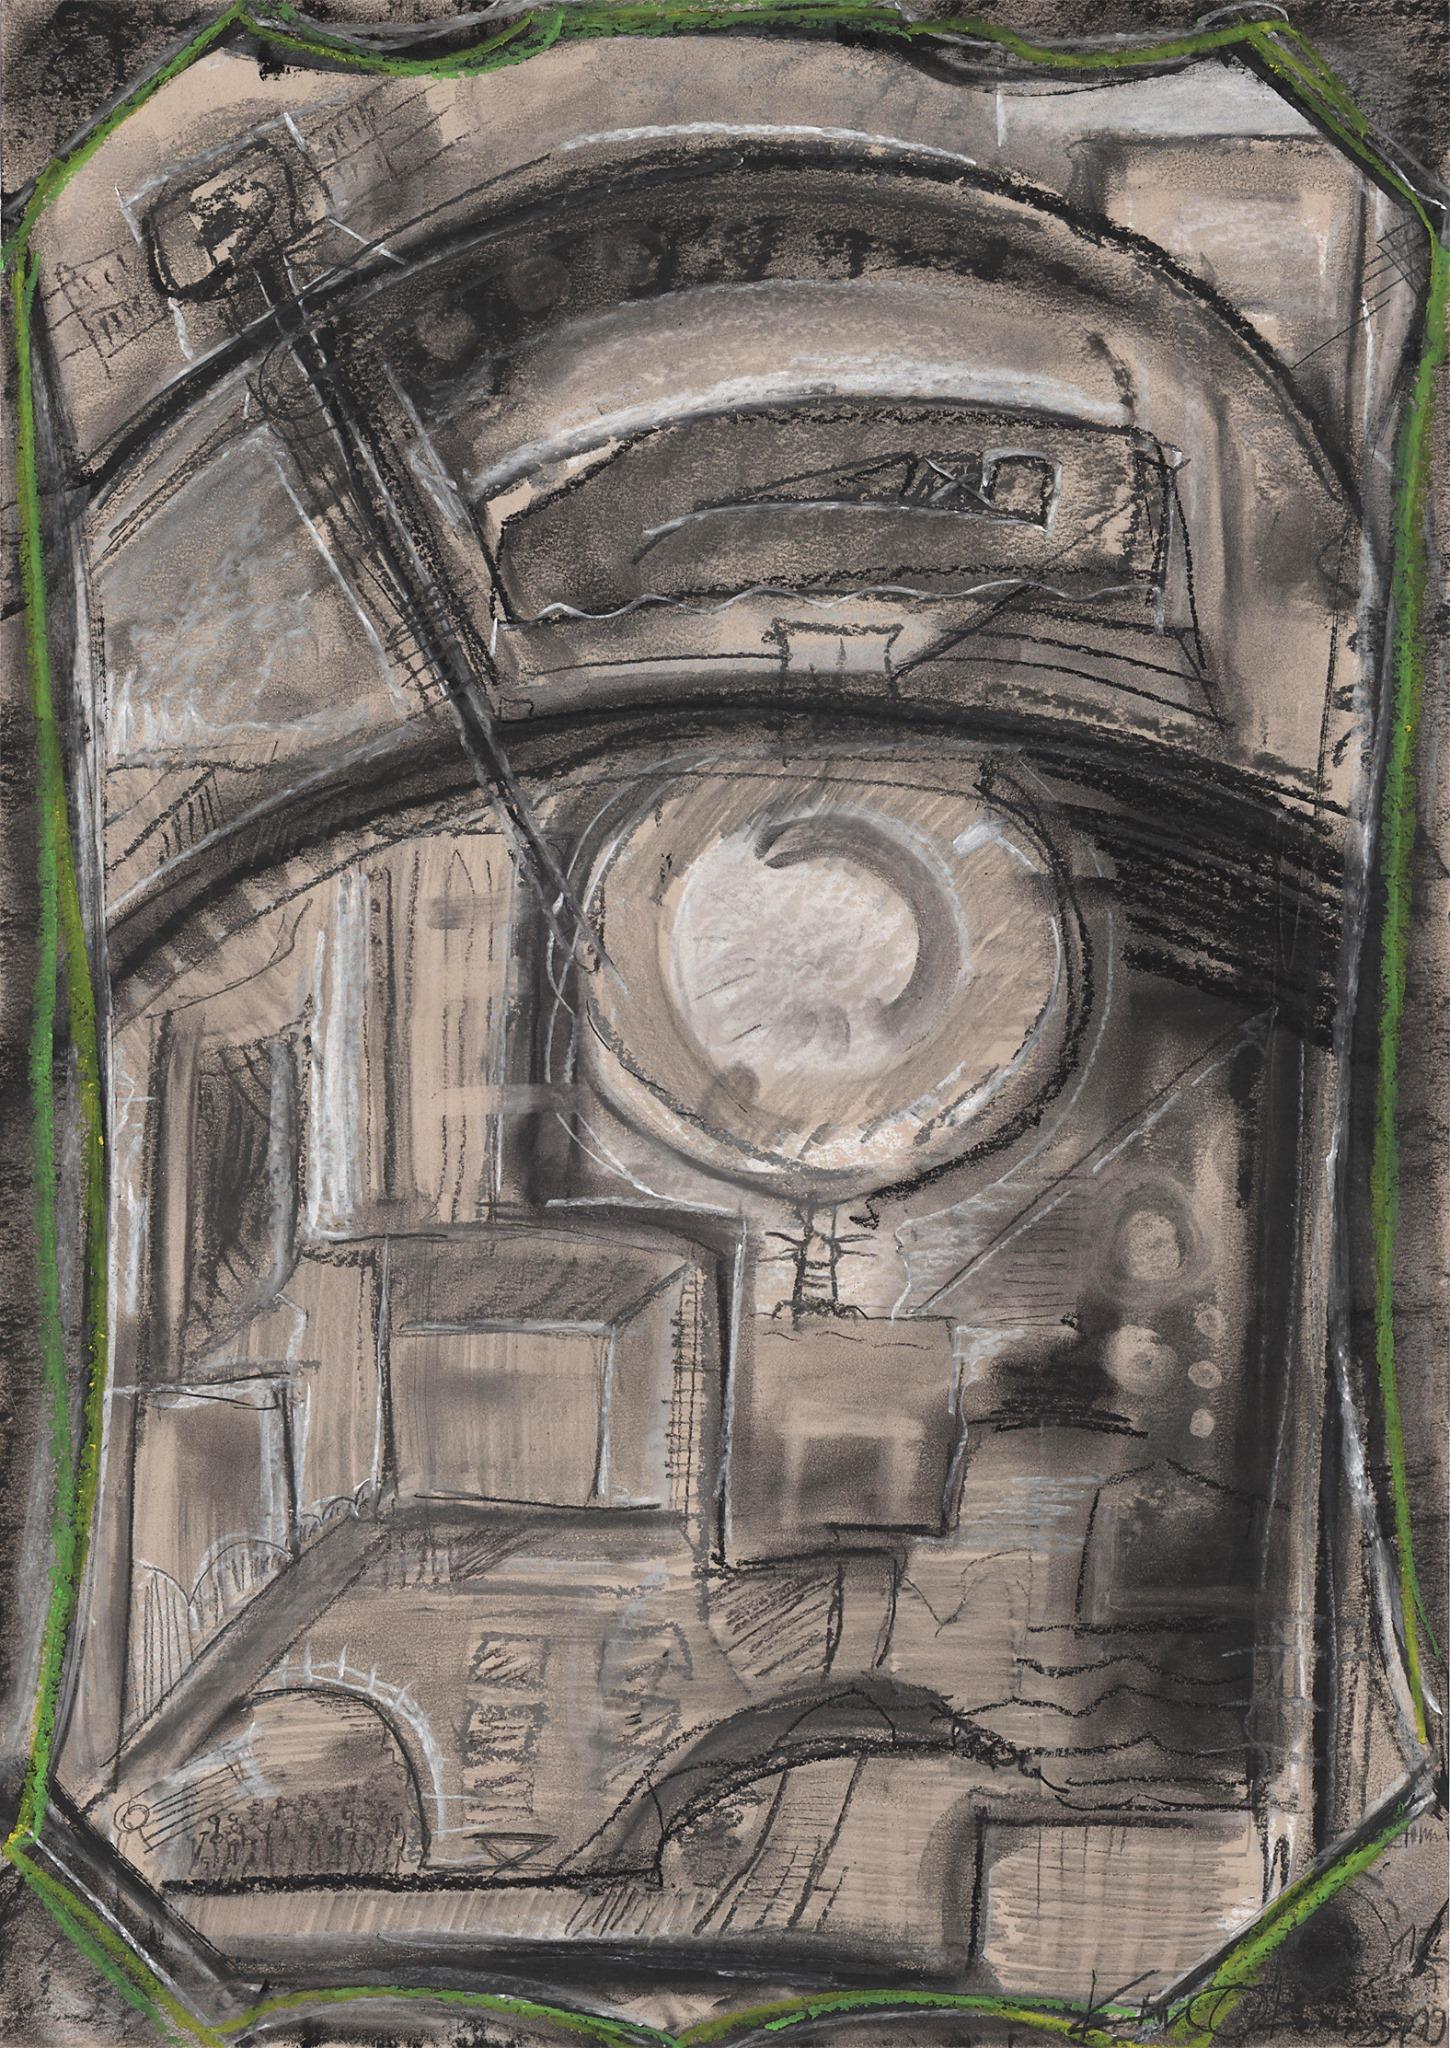 Kim Okura ANNO 3019 Dystopische Zukunftsstadt 1